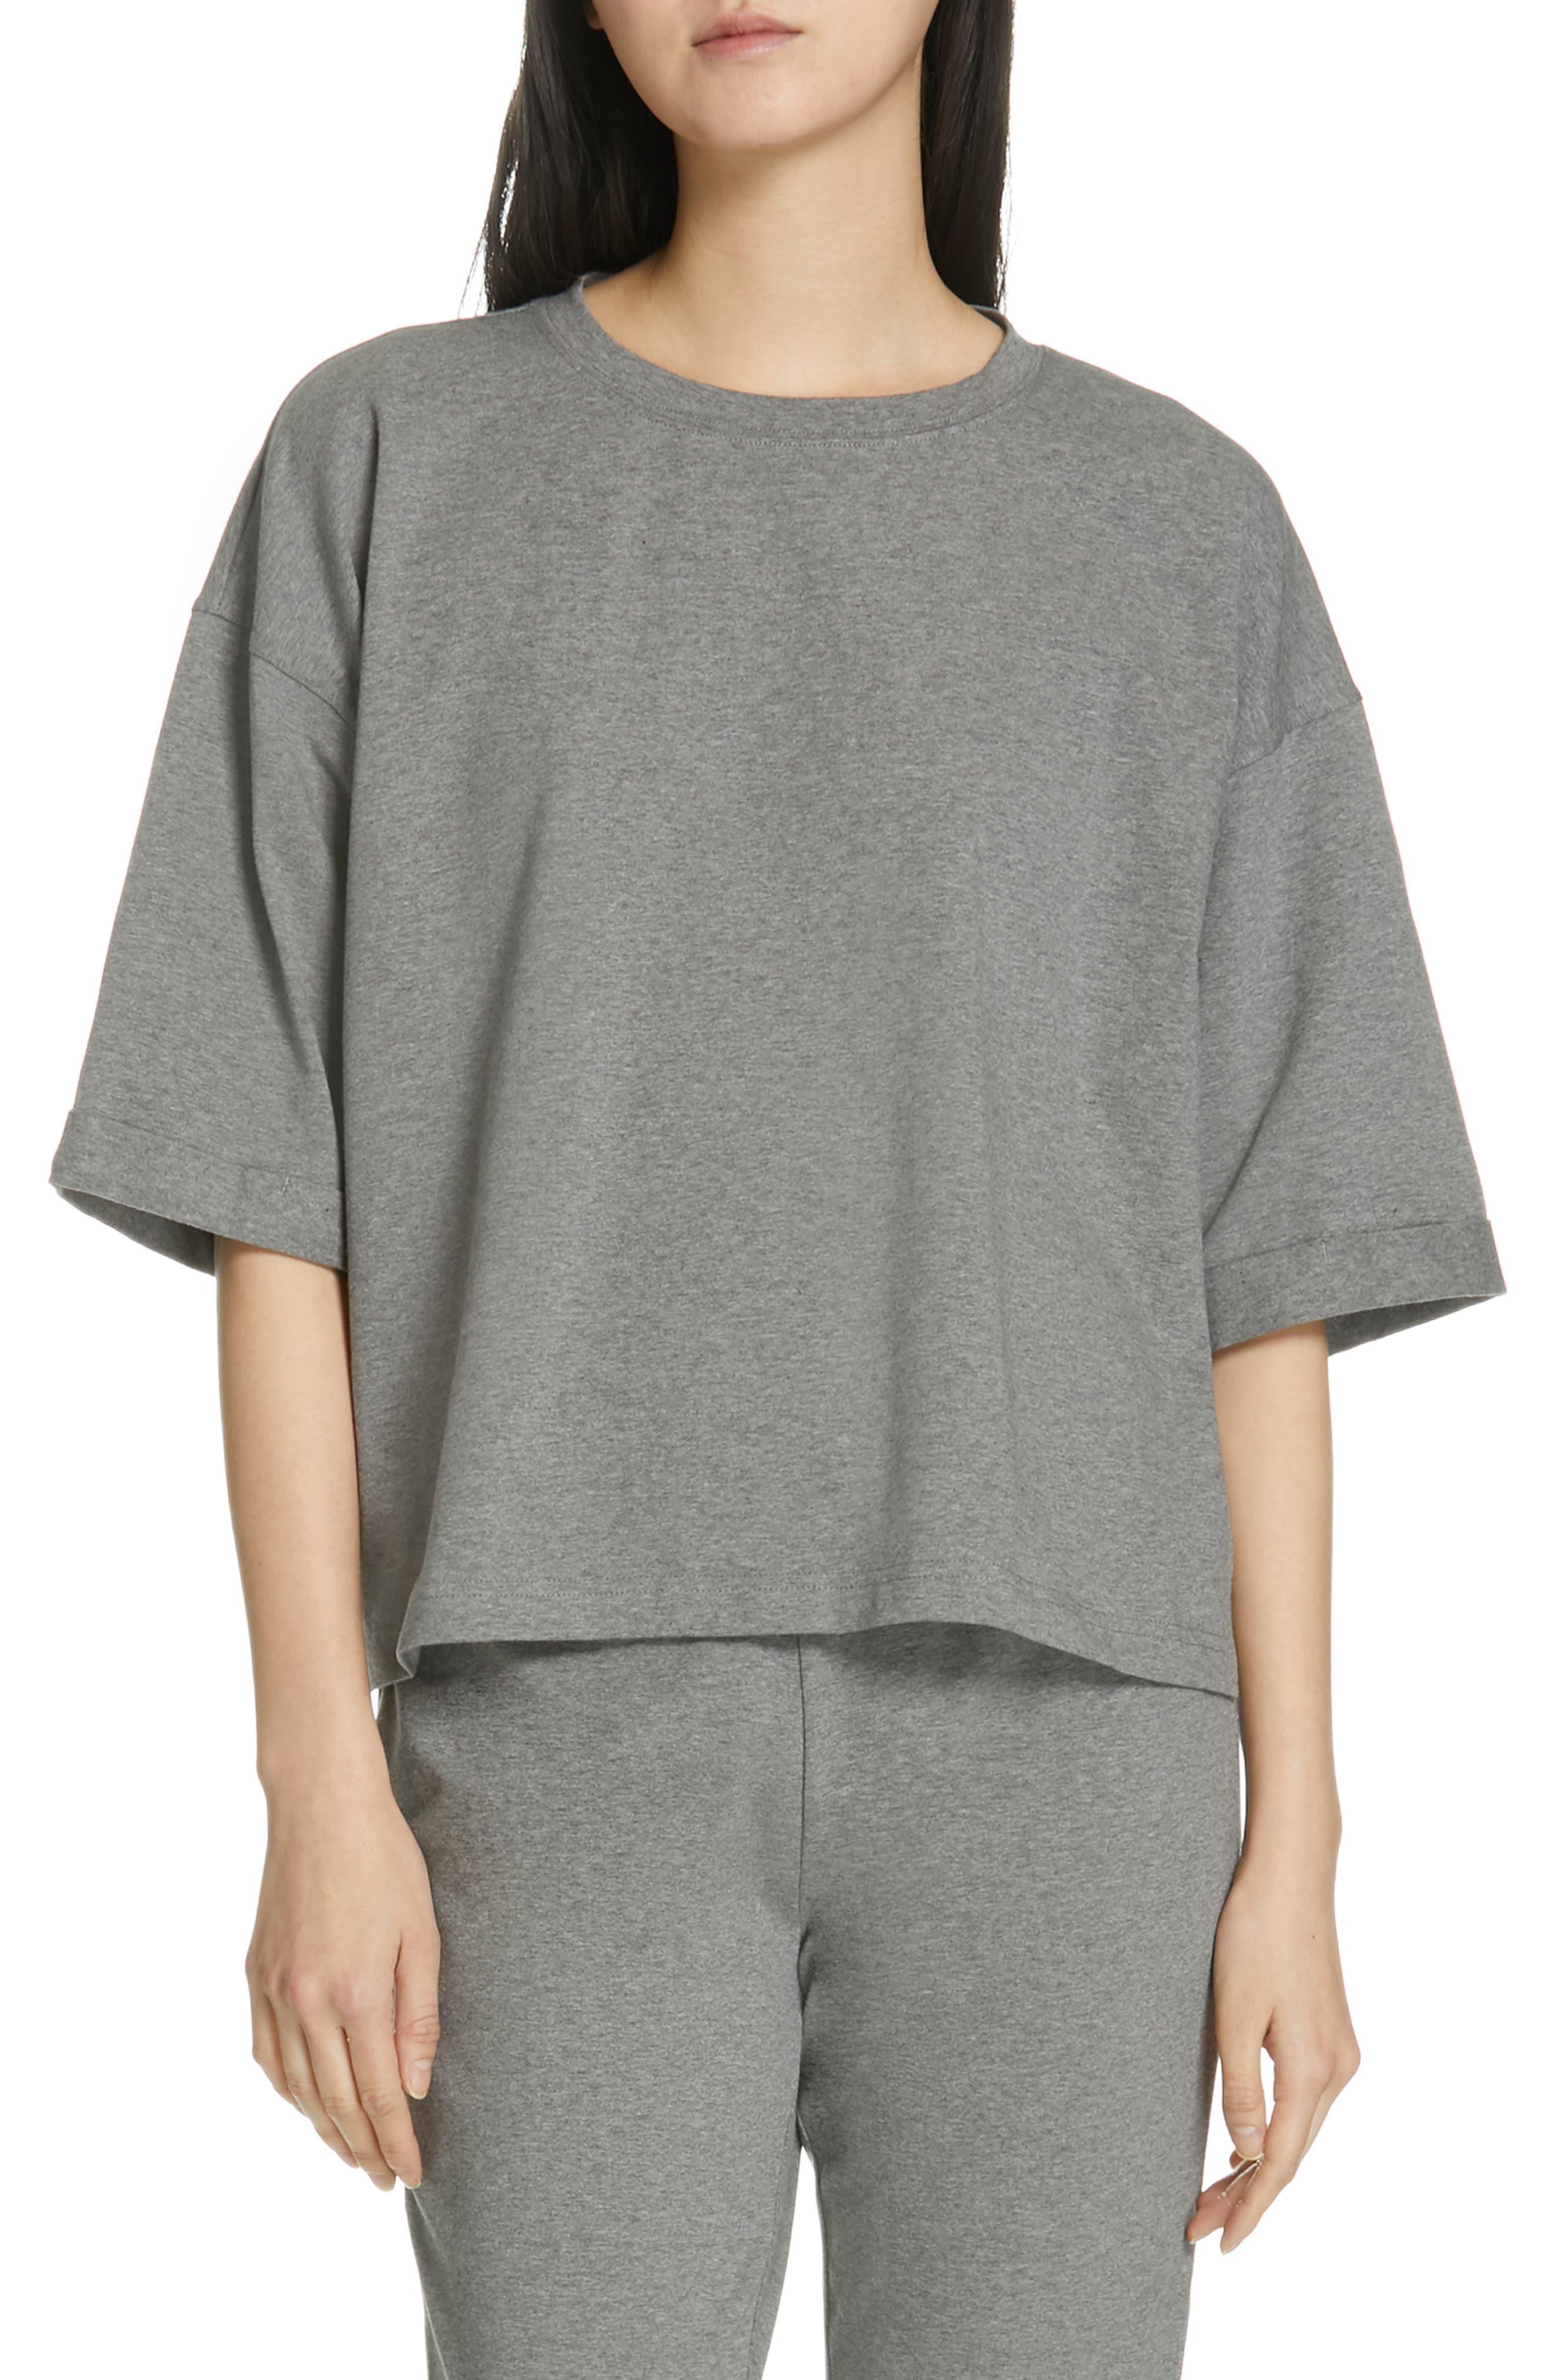 Eileen Fisher Stretch Organic Cotton Top, Grey